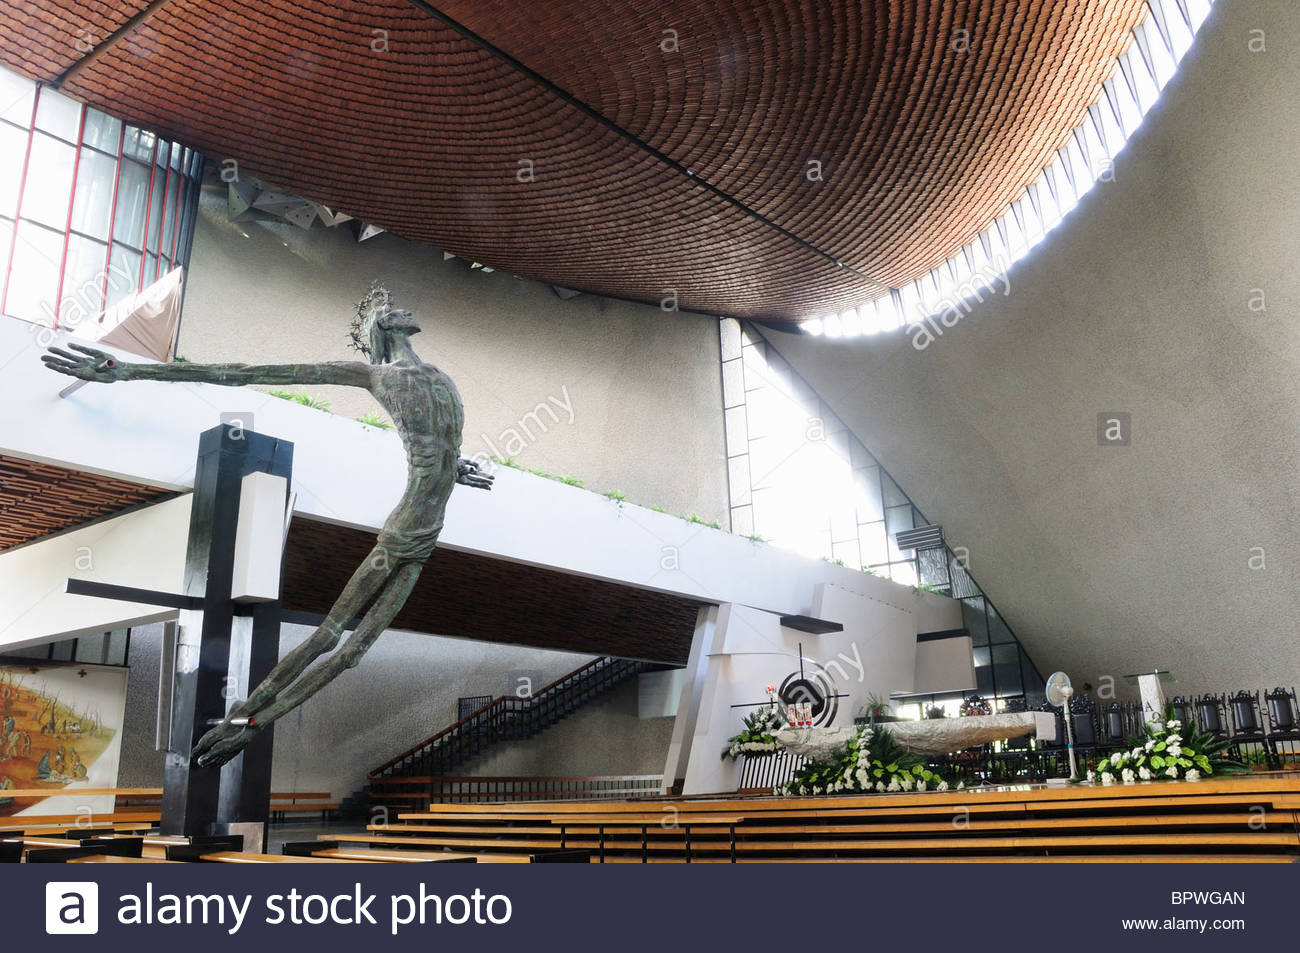 NVchurch-interior-with-bronislaw-chromys-crucifix-ark-of-god-church-BPWGAN.jpg